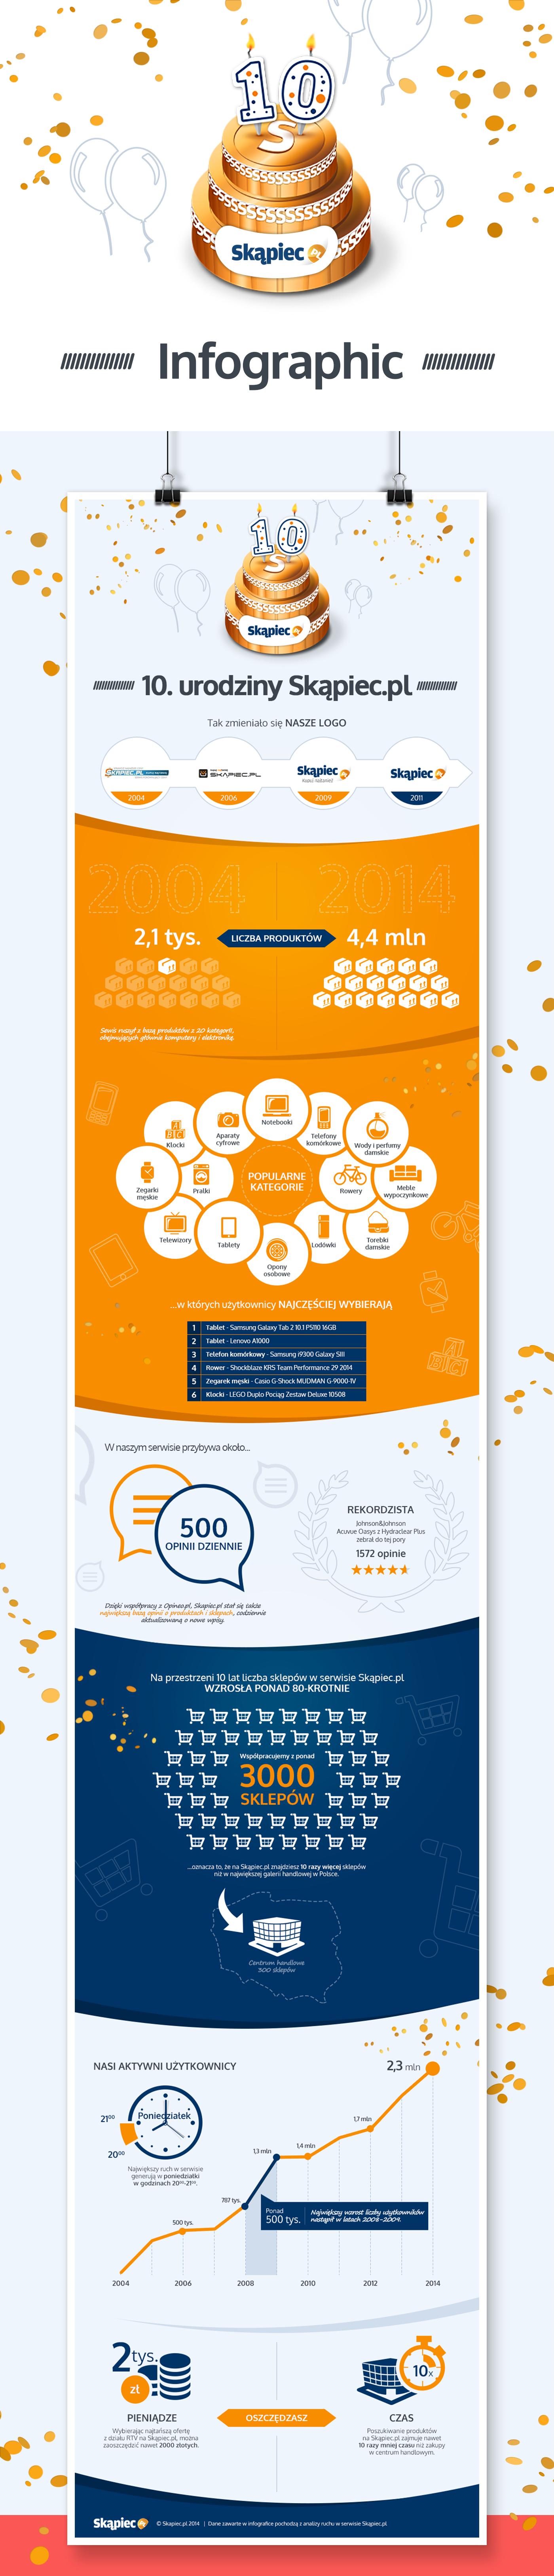 infographic Birthday skapiec.pl justinmedia Tomasz Justyna timeline